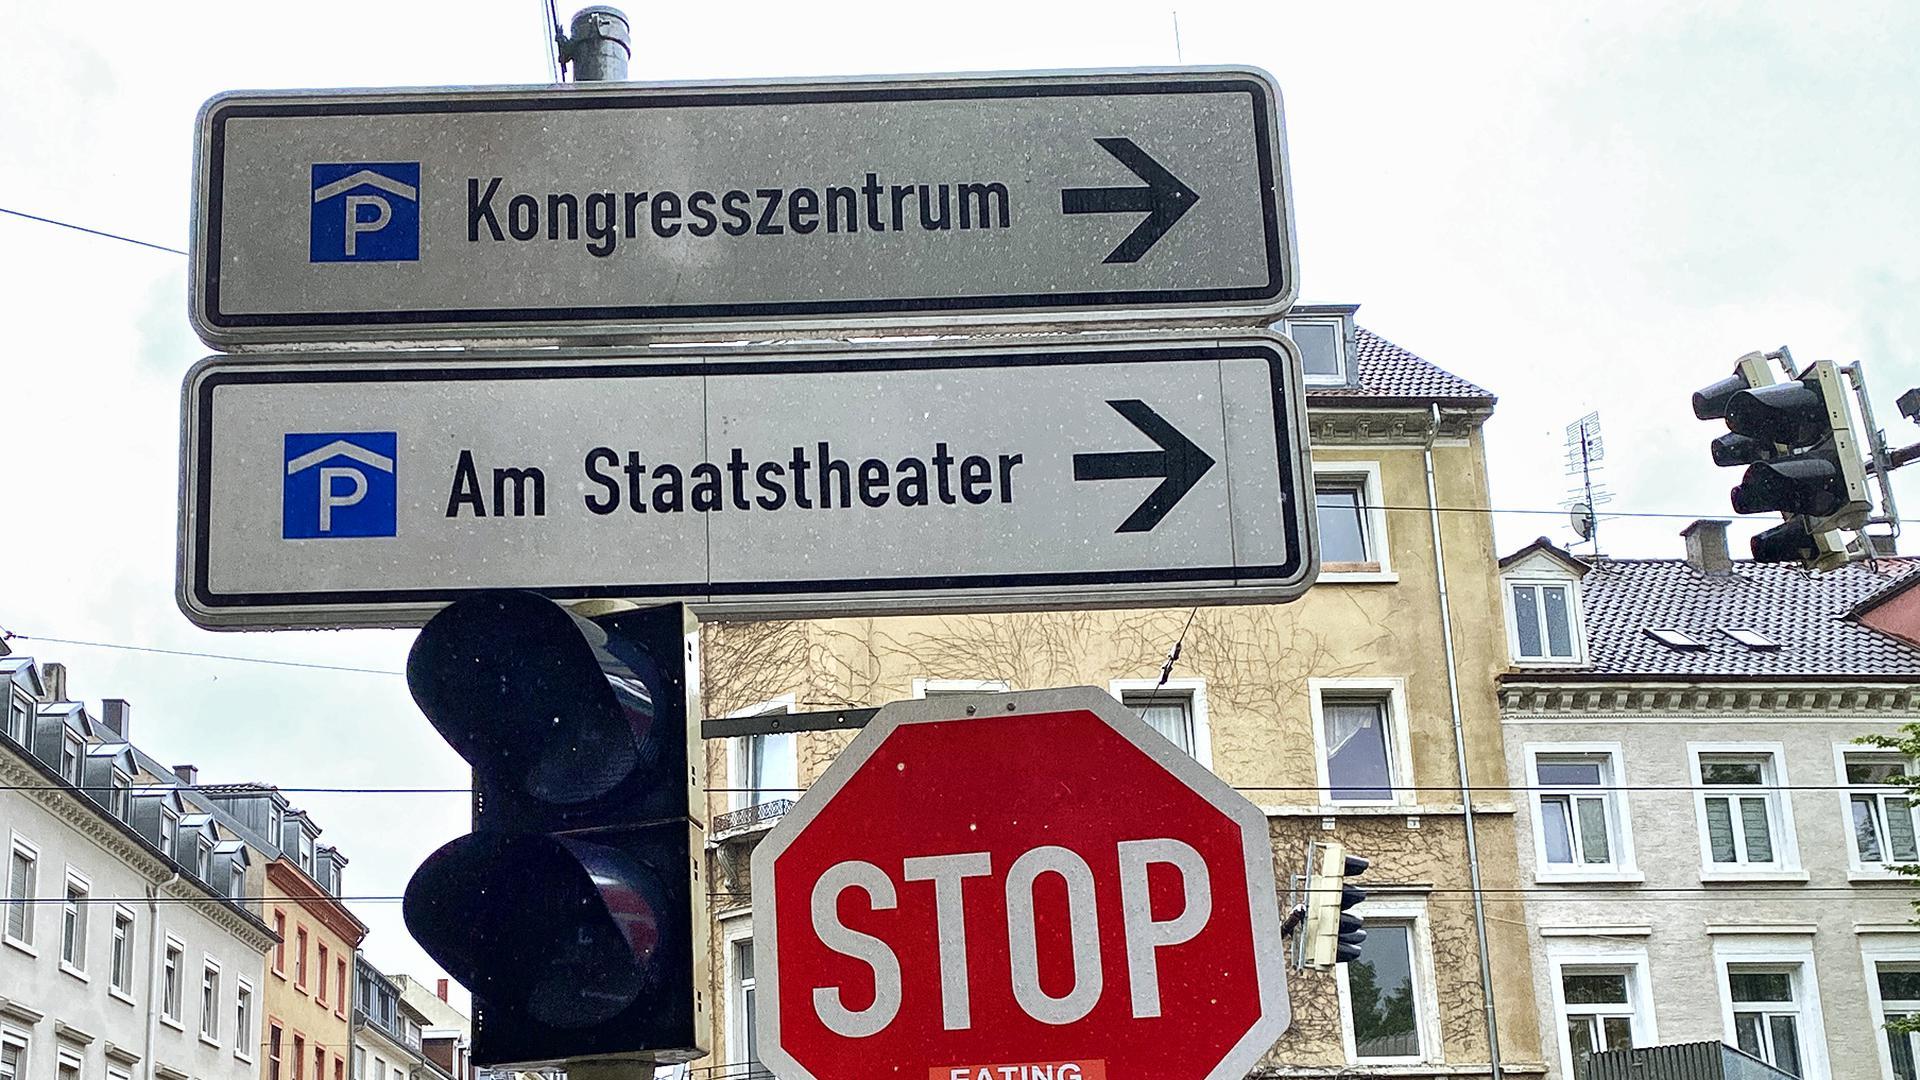 16.07.2020 Badisches Staatstheater